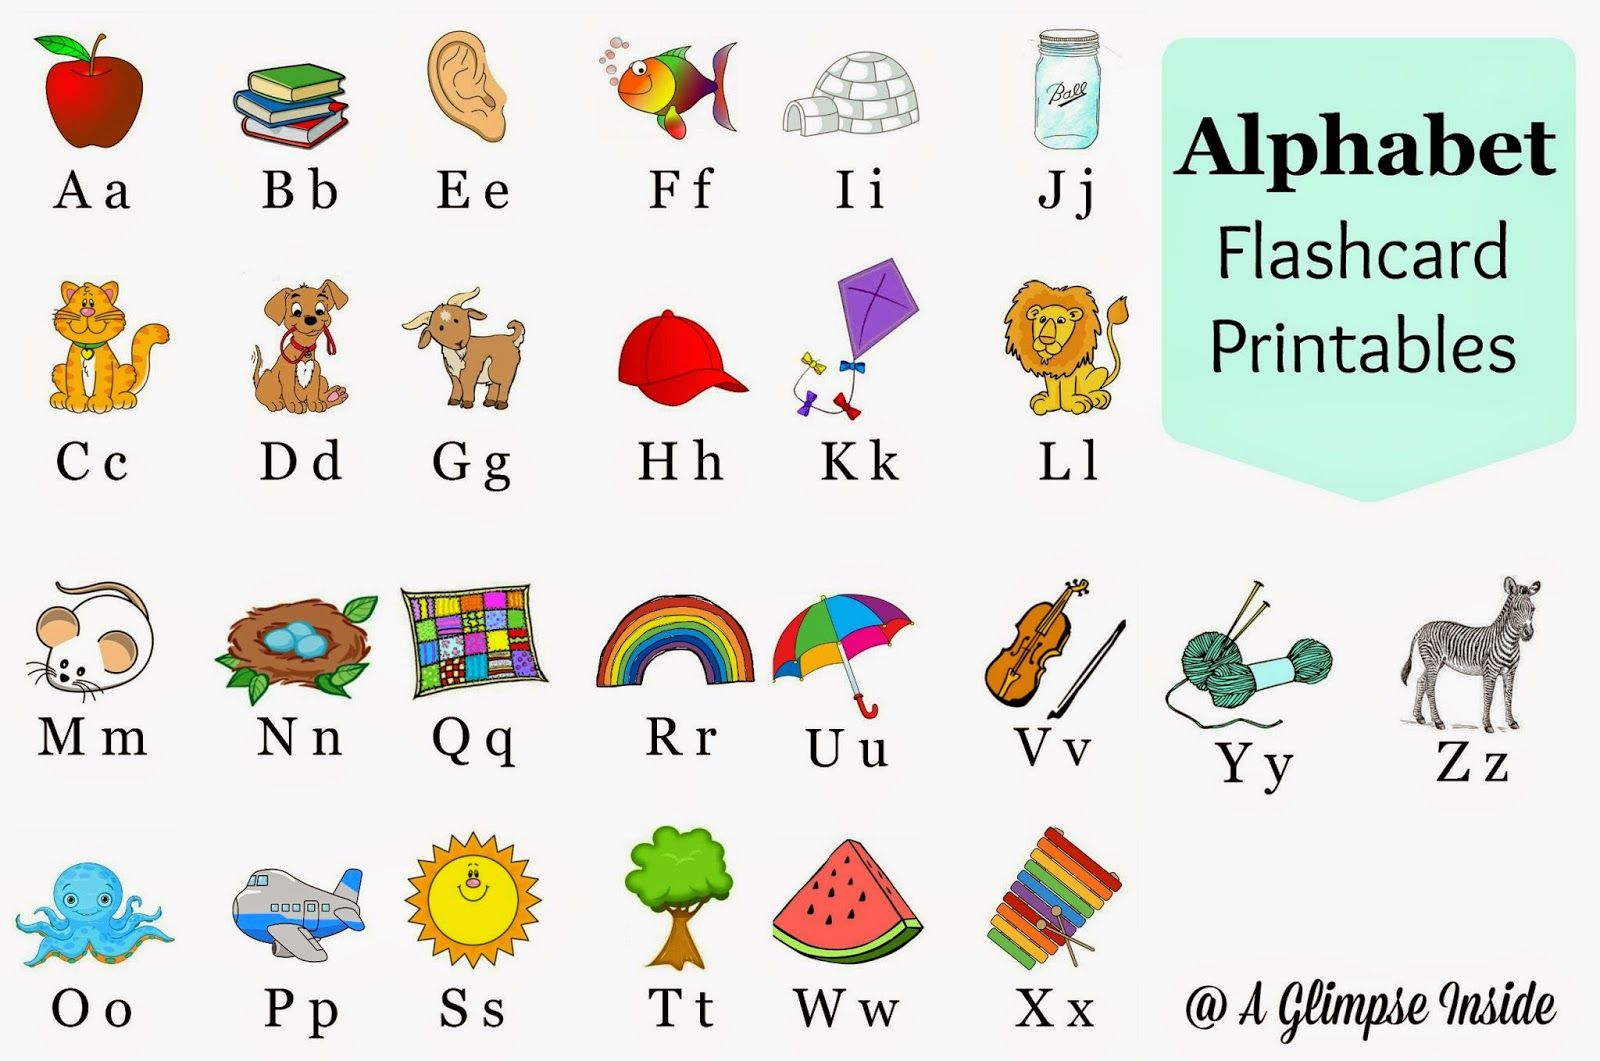 A Glimpse Inside Alphabet Flashcards Printables